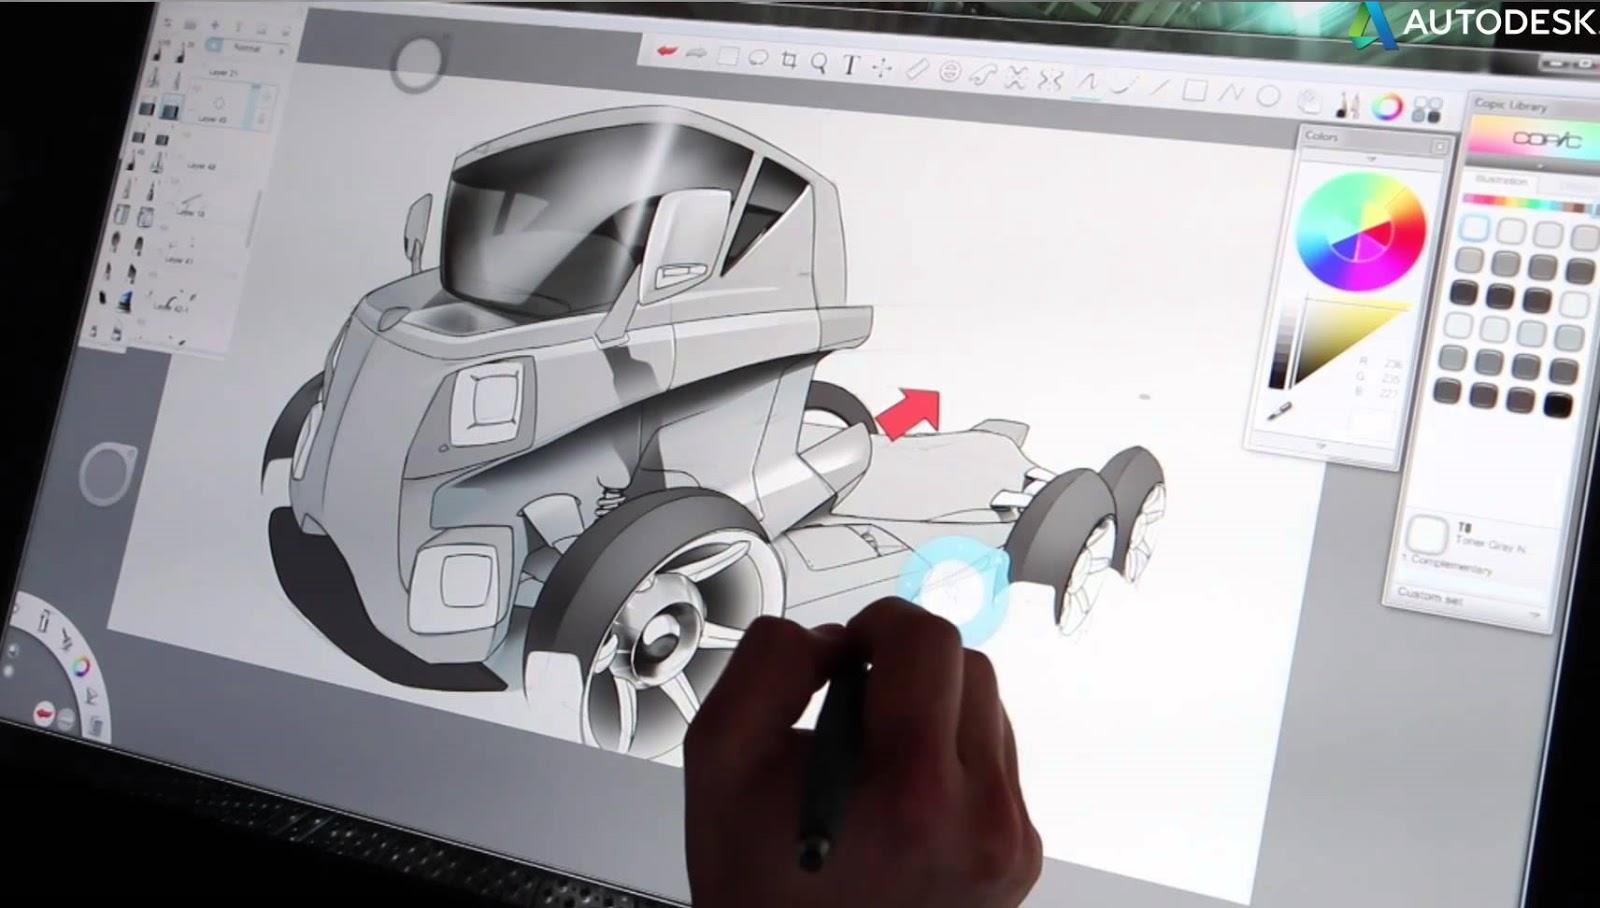 Autodesk sketchbook Pro 2015 rar